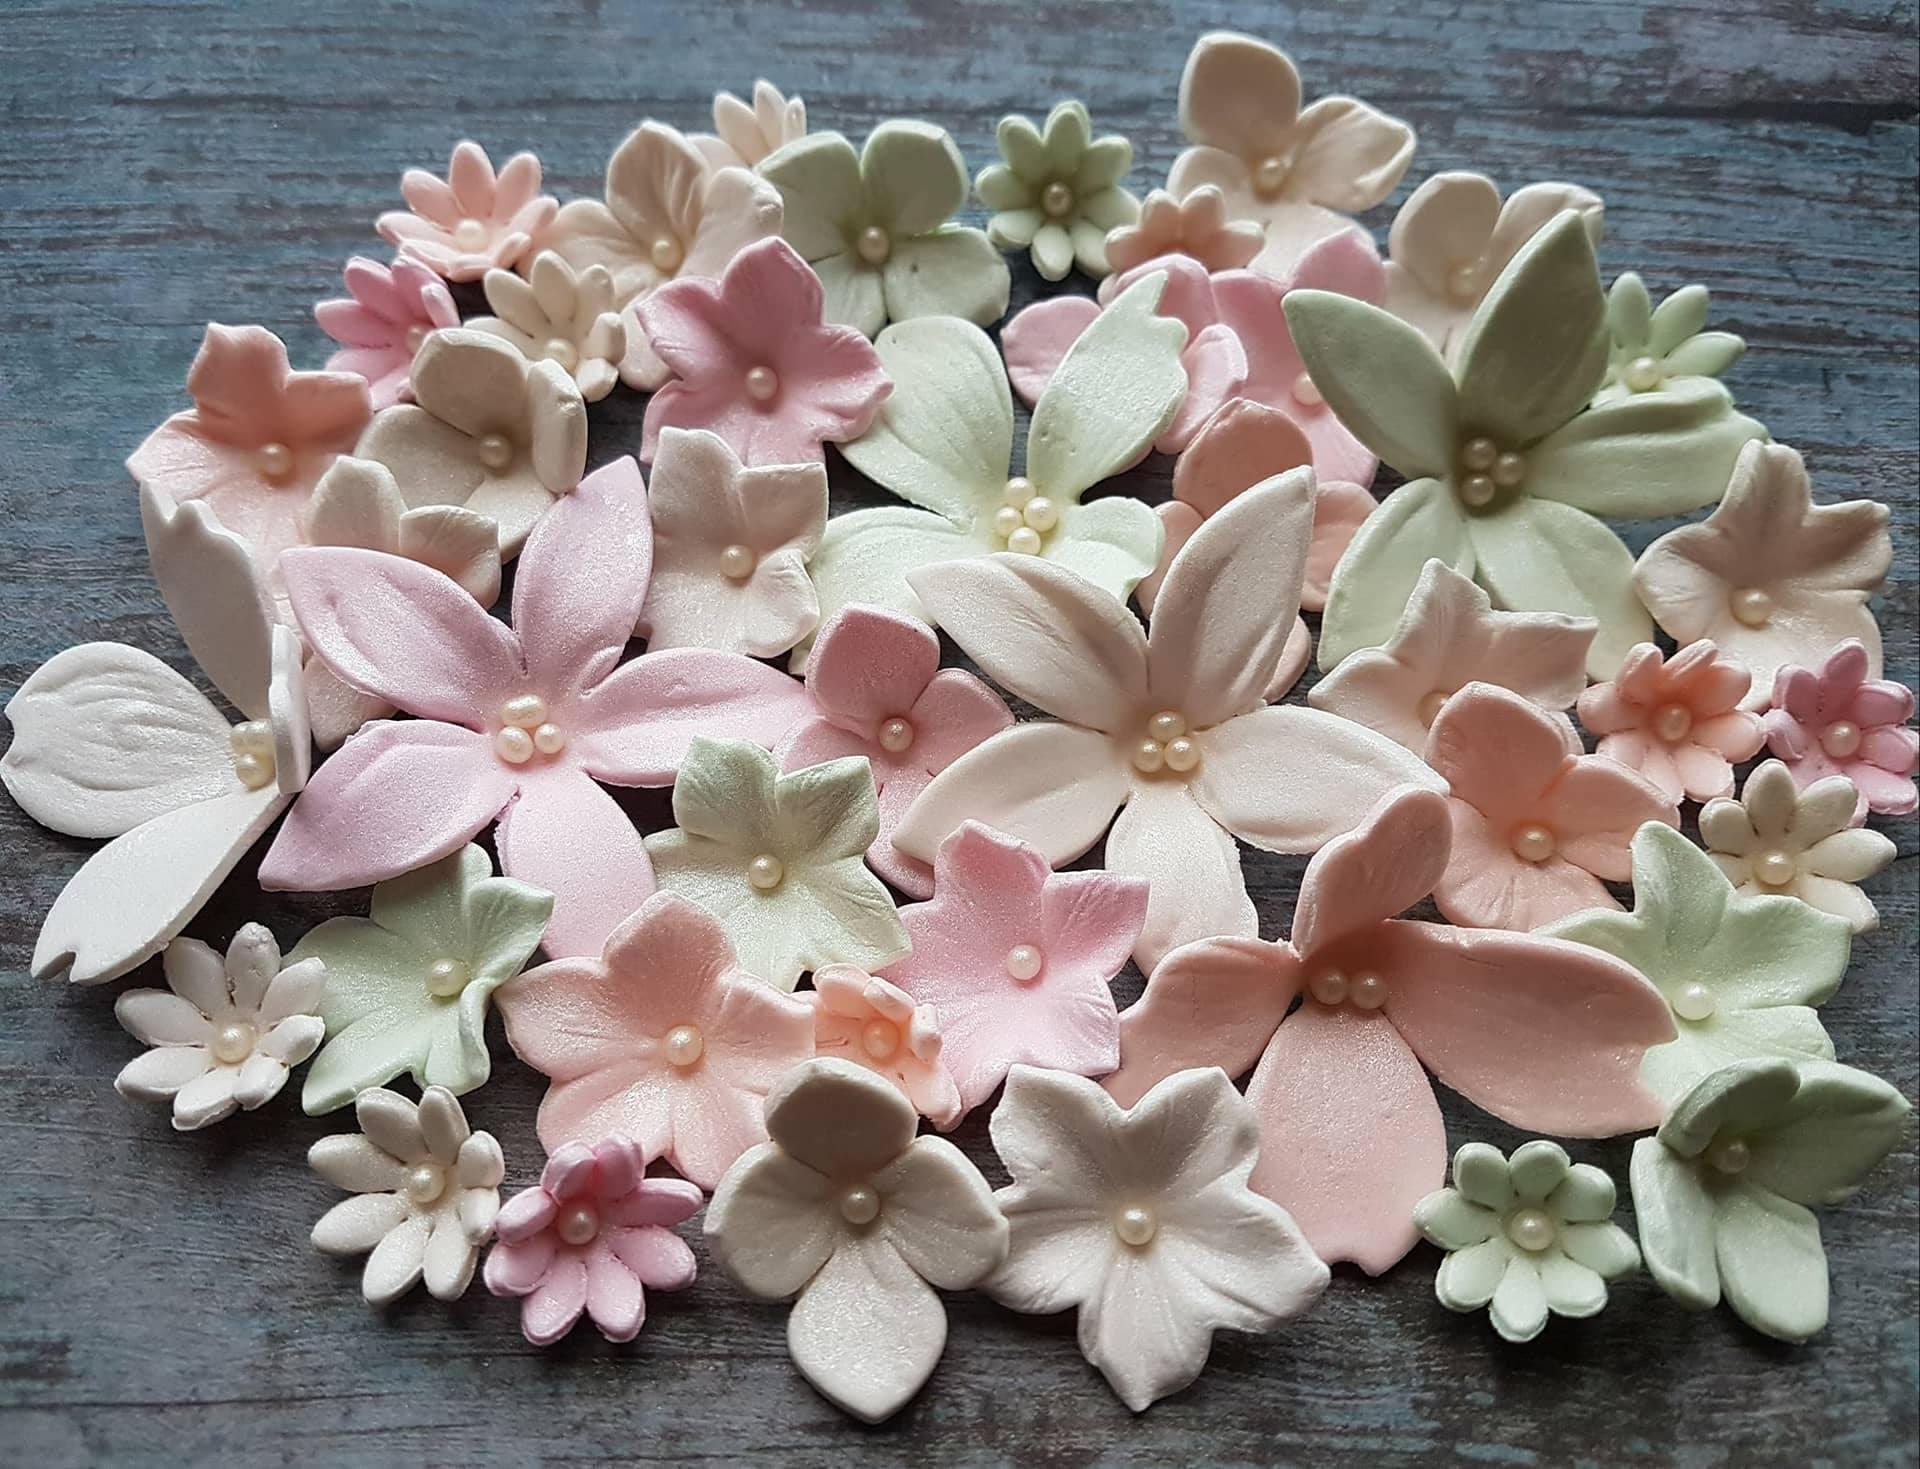 40 Edible Sugar Fondant Flowers Lilies Asian Dogwood Daisies Petunia